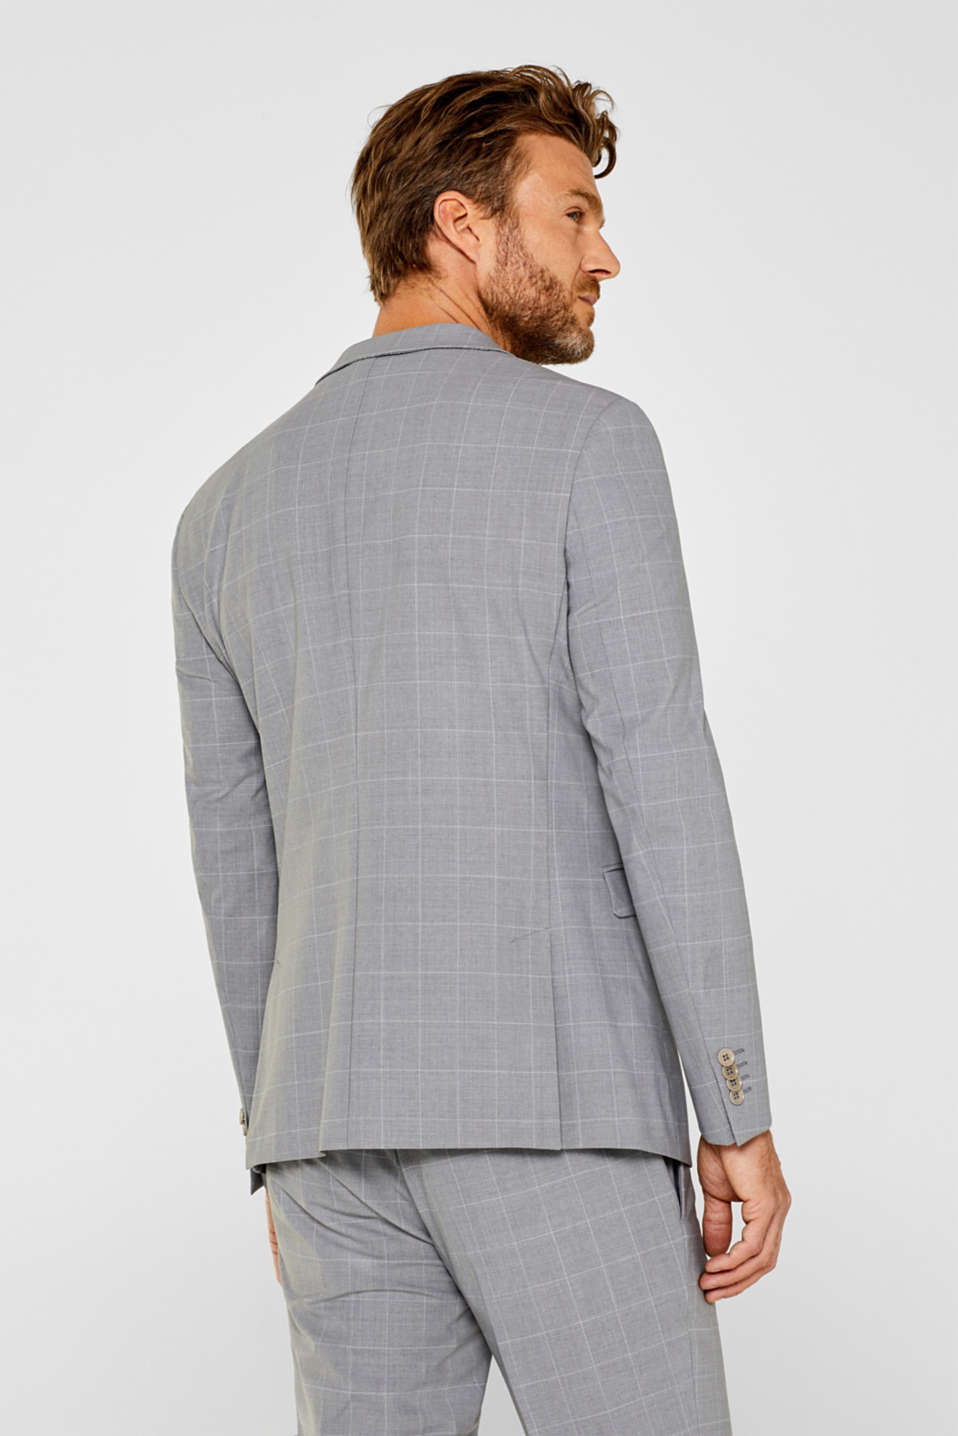 Blazers suit, LIGHT GREY, detail image number 3